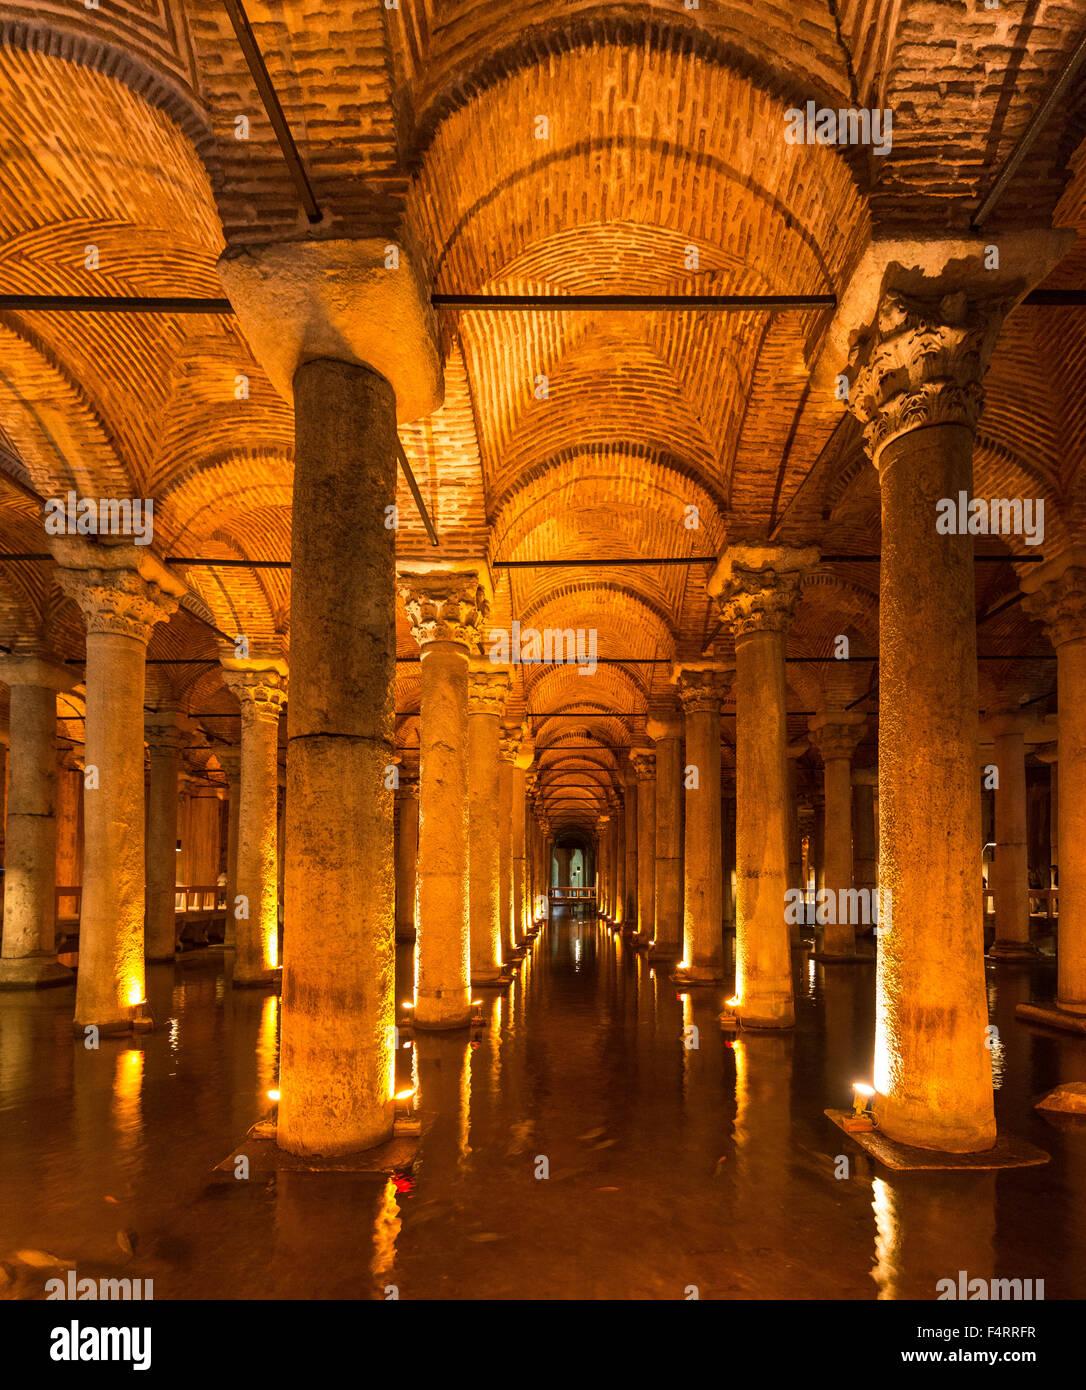 Yerebatan Cistern, Basilica Cistern, Sunken Palace, Istanbul, Turkey - Stock Image